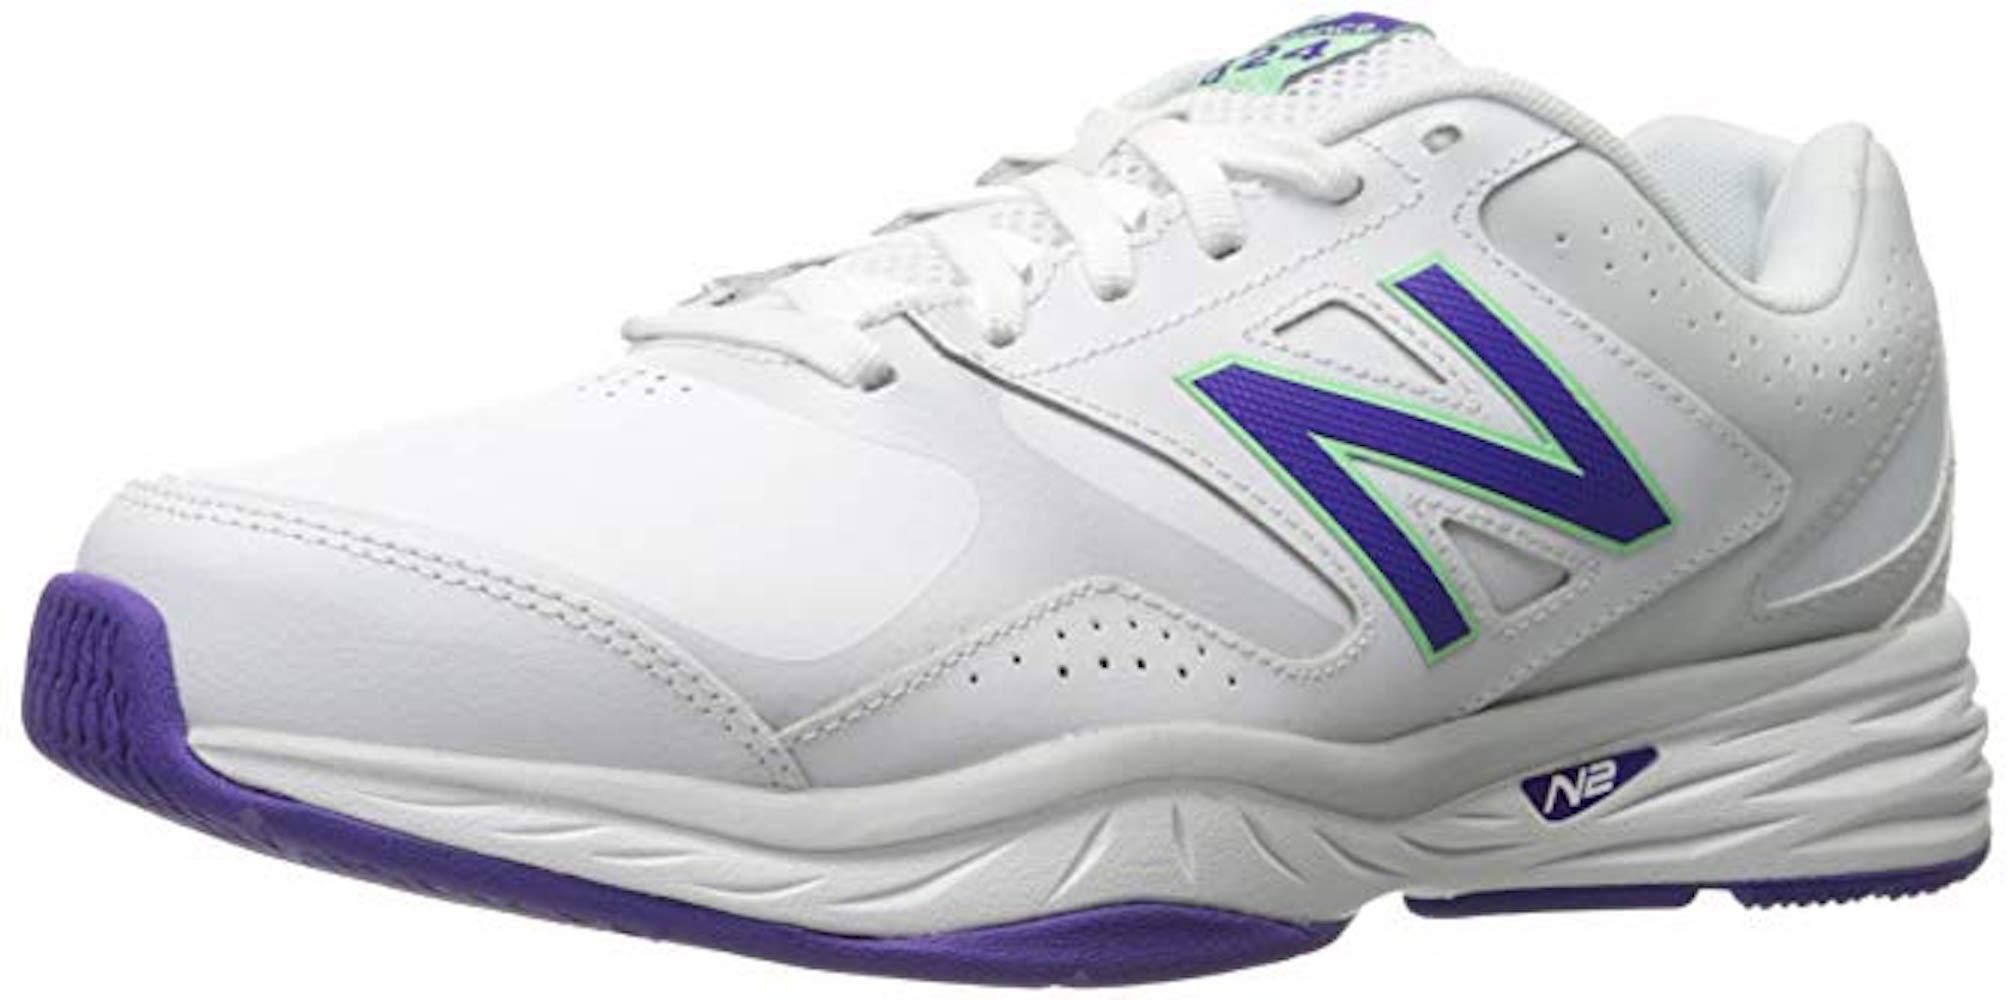 Detalles de New Balance 824v1, Zapatos Para Correr Mujeres, Bajos & Medios, Cordon, Piel, Ta